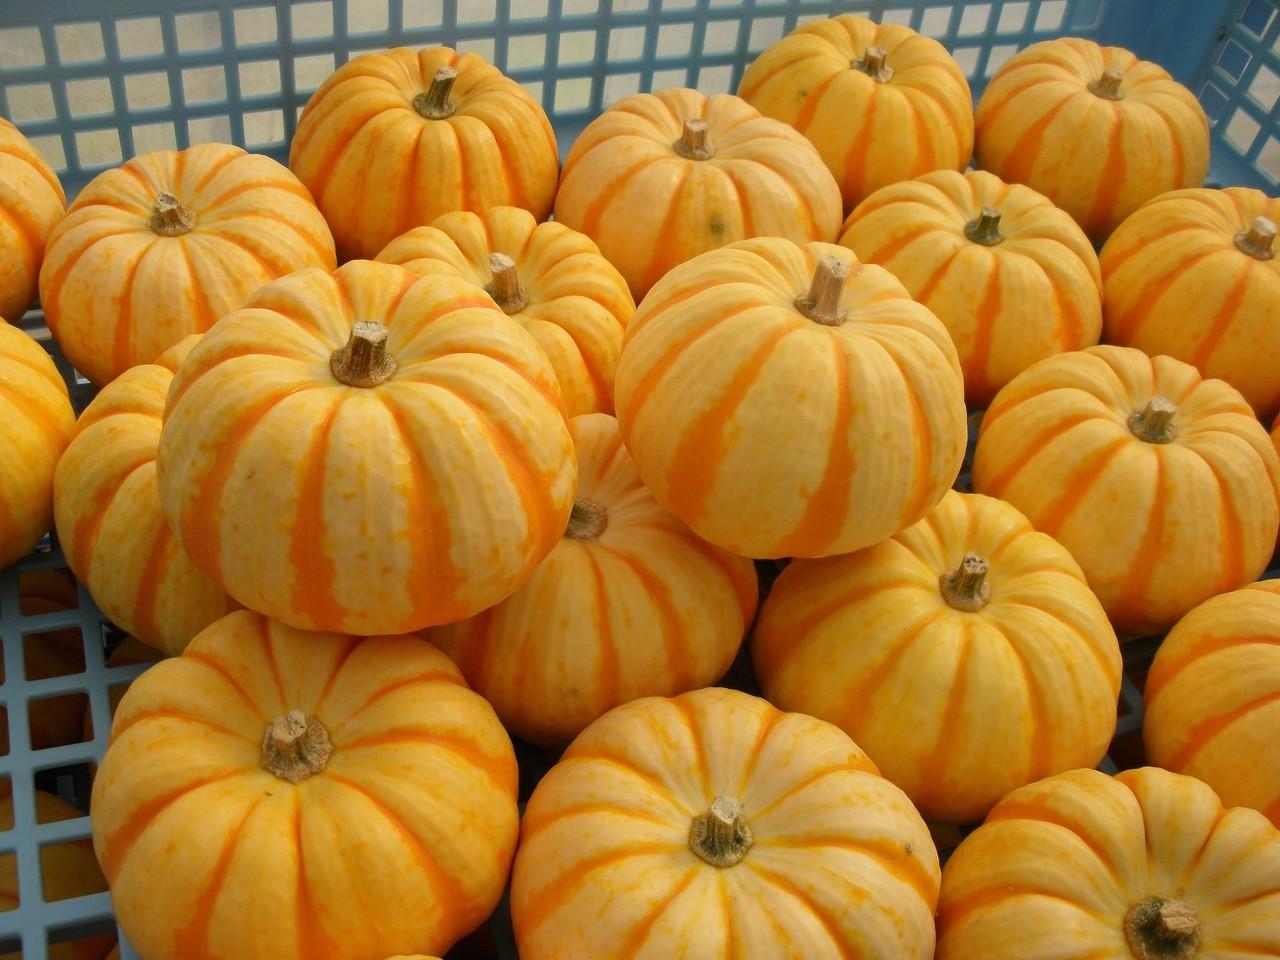 COOKPADで見つけた激ウマかぼちゃレシピ・1